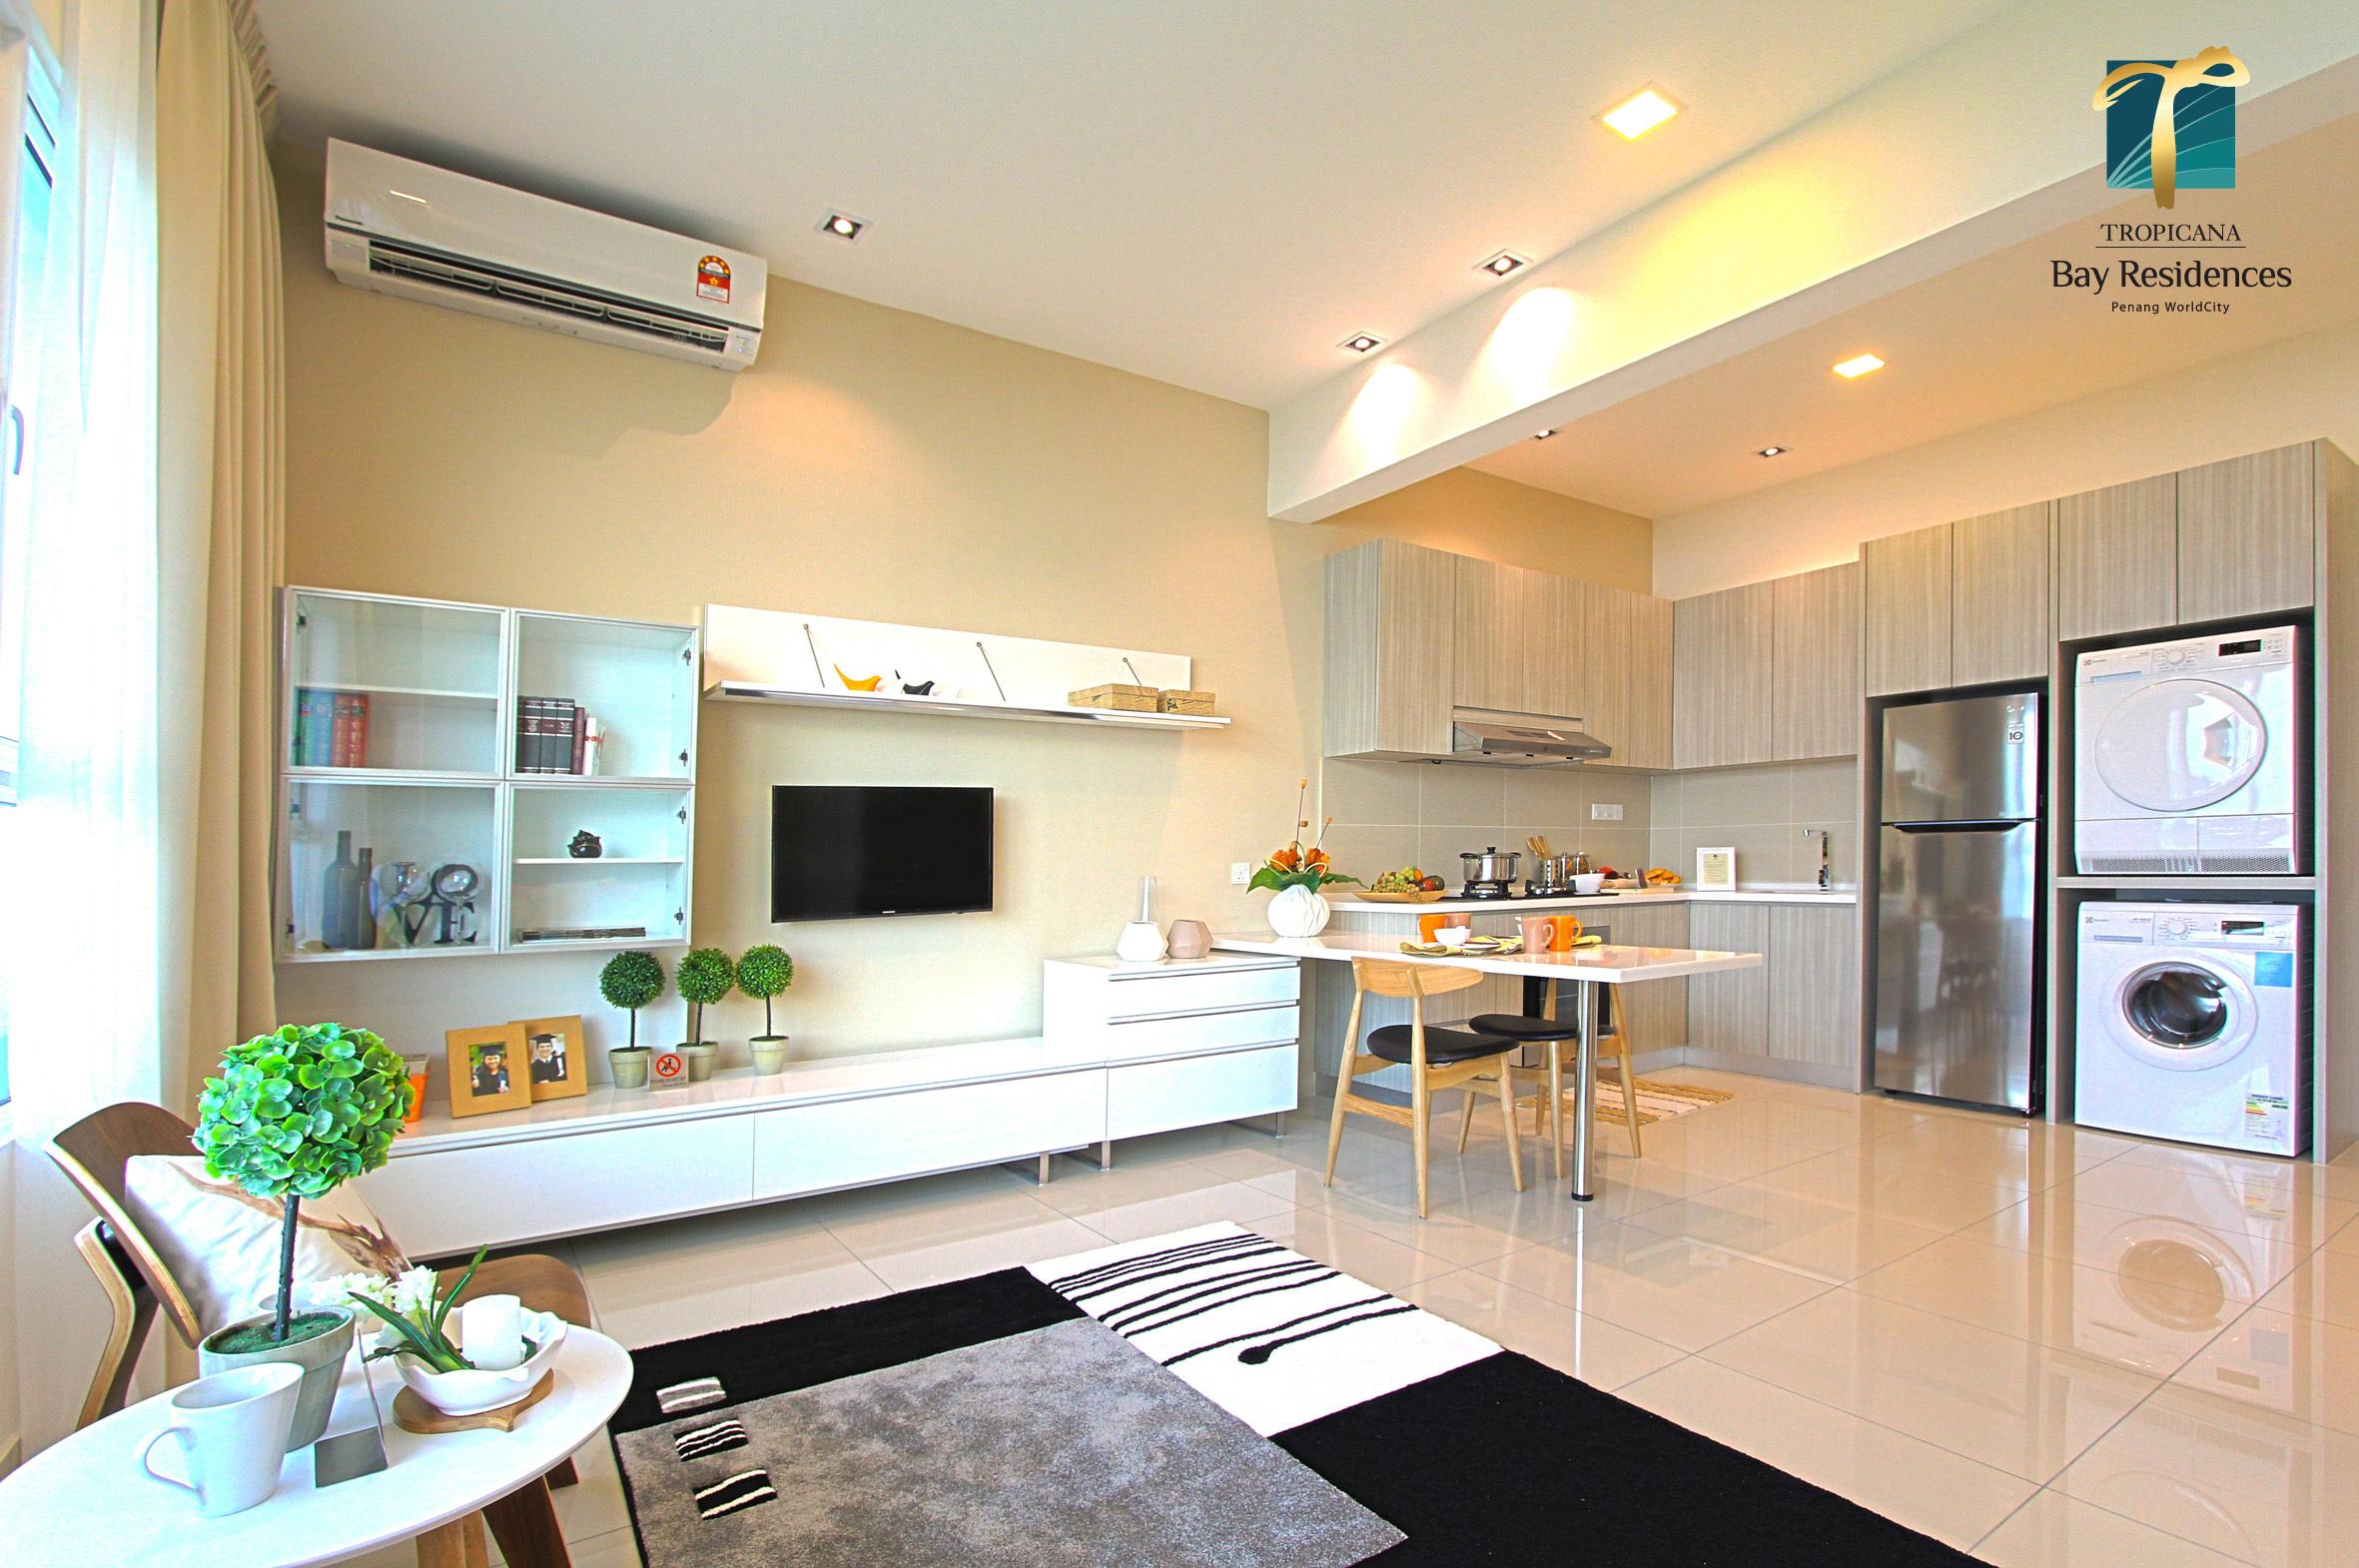 Tropicana Bay Residences Penang Worldcity Review Propertyguru Malaysia